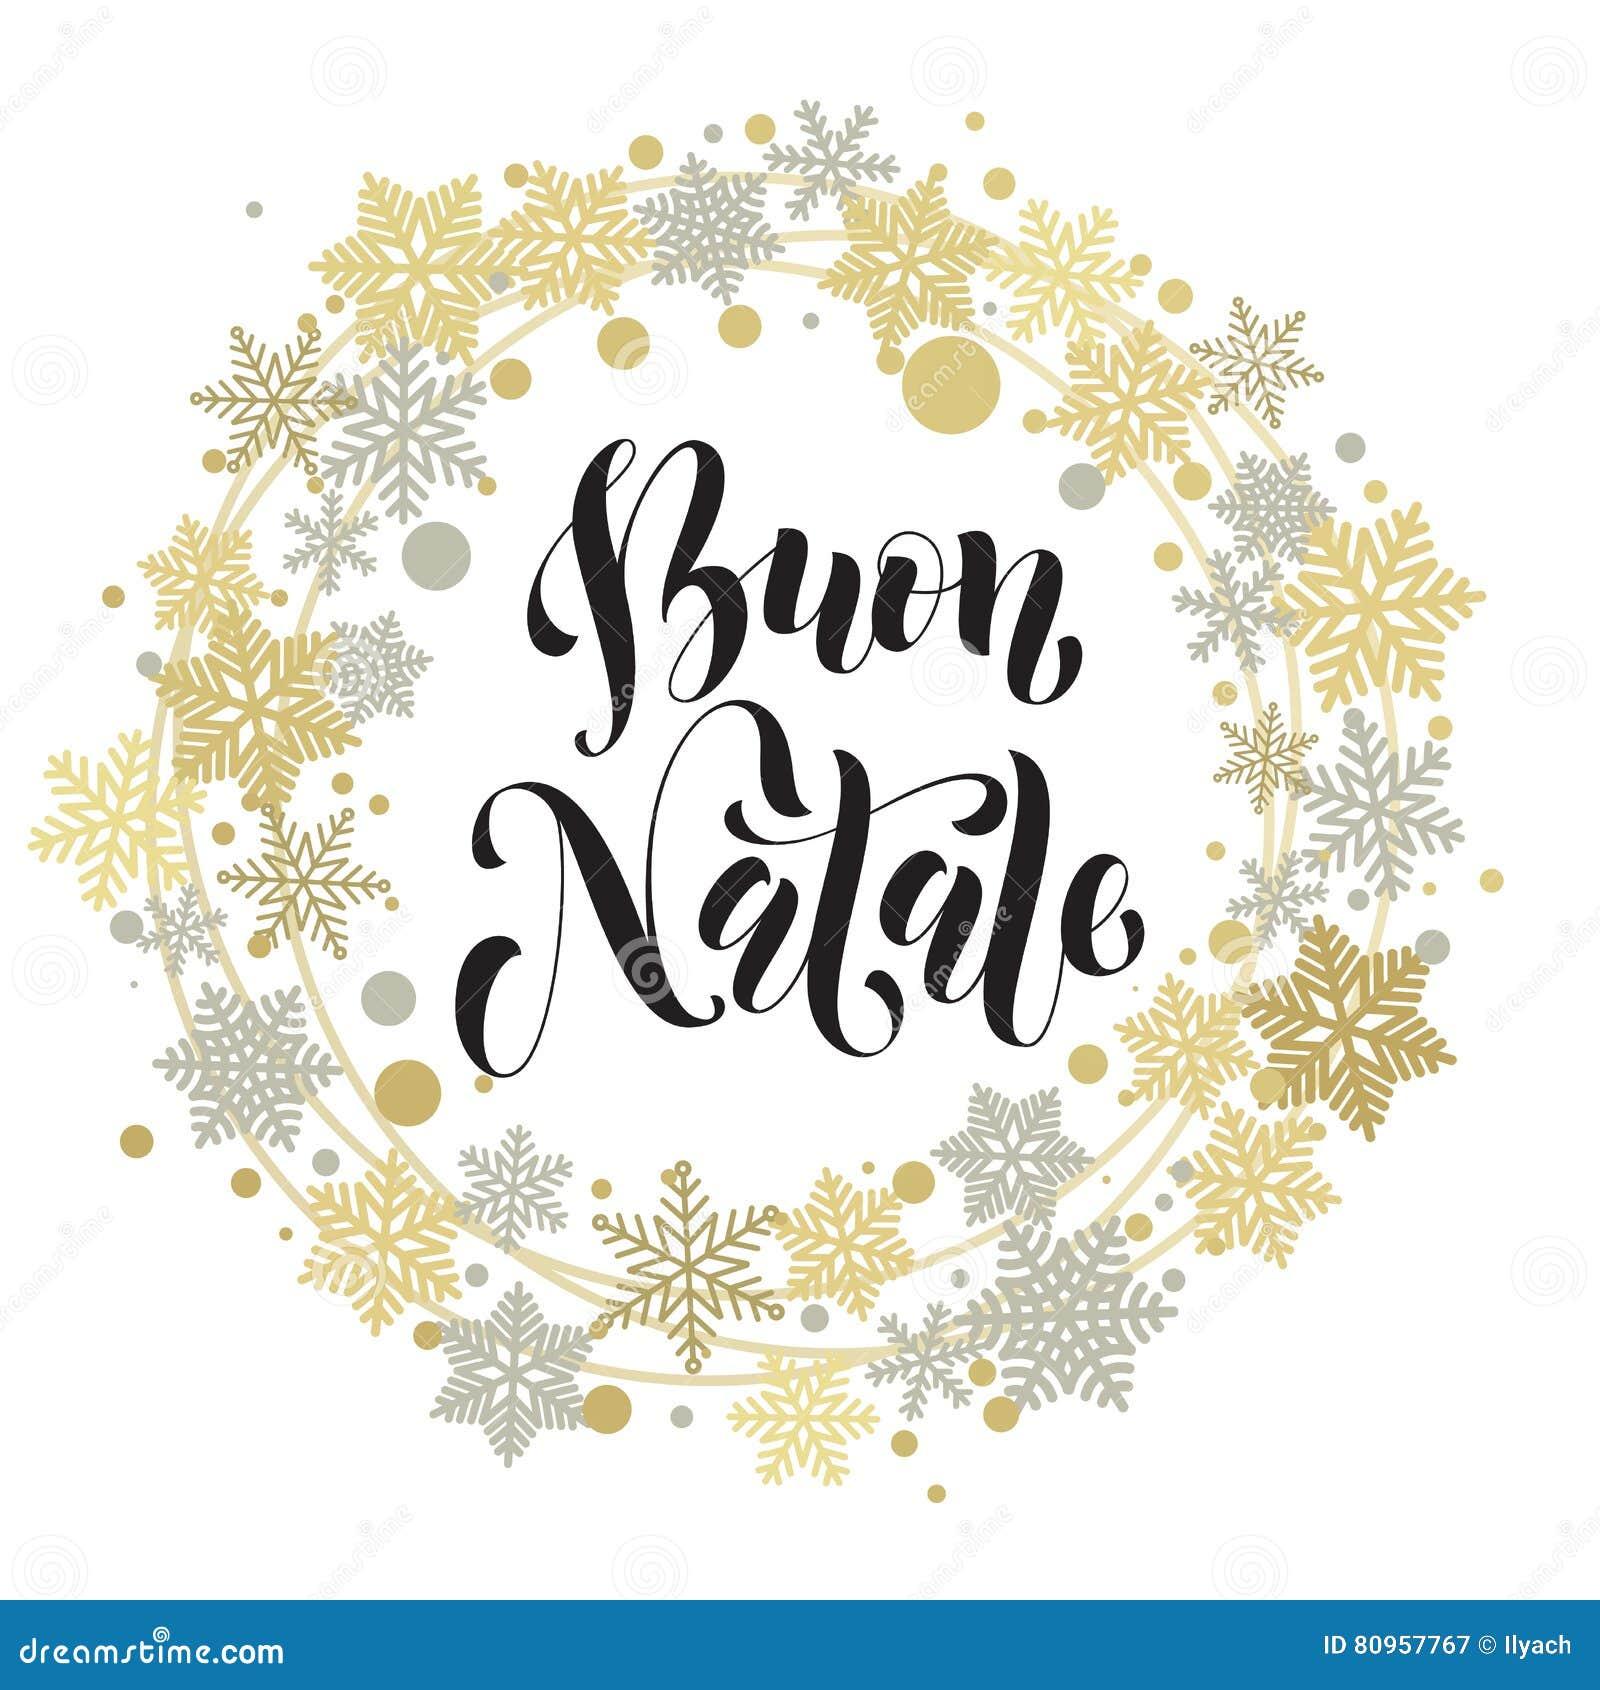 Buon Natale Italian Merry Christmas Text Greeting Card